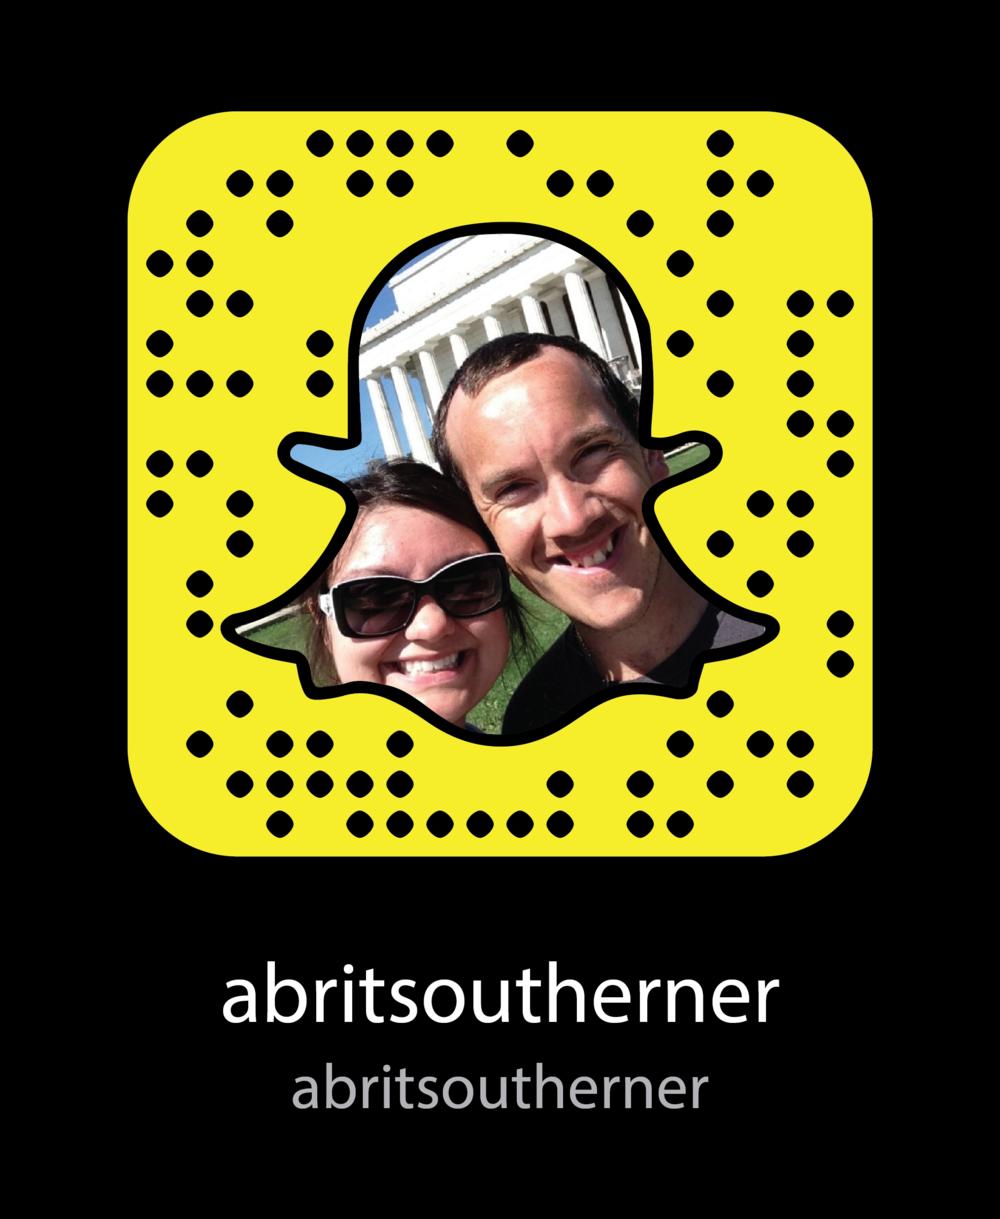 ABritSoutherner-Travel-snapchat-snapcode.png